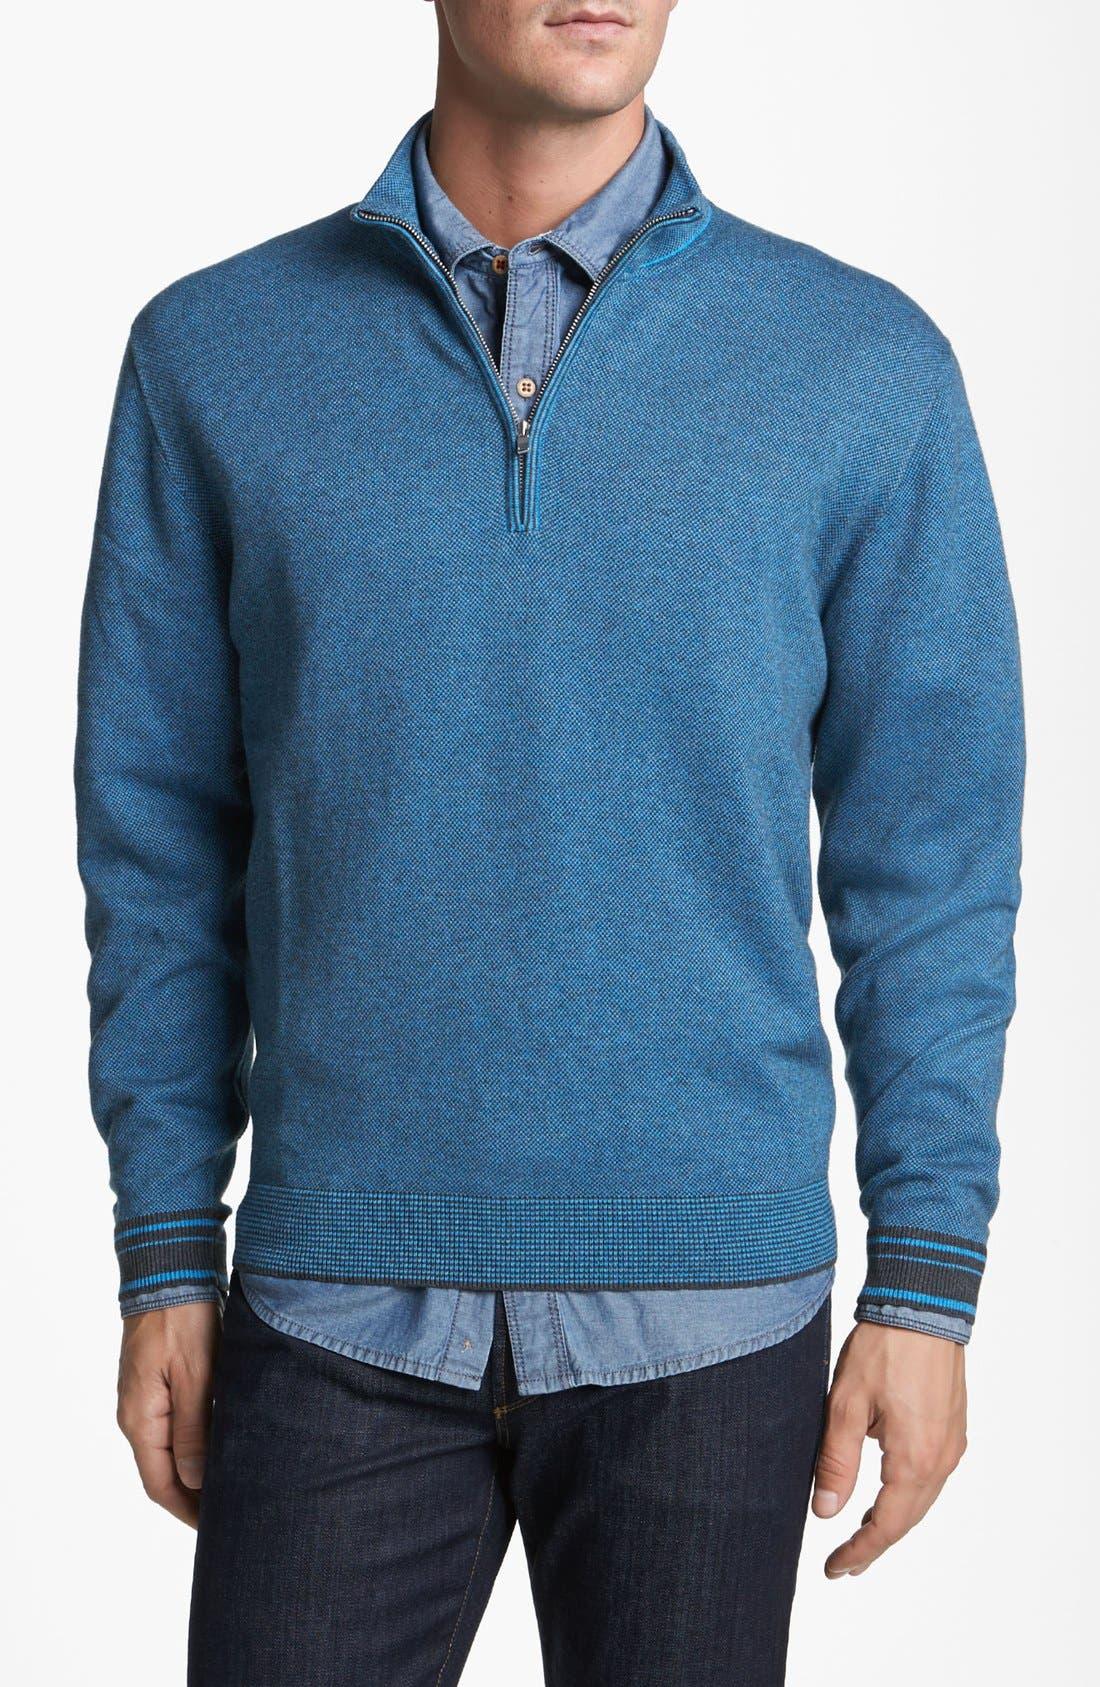 Alternate Image 1 Selected - Cutter & Buck 'Haven' Half Zip Bird's Eye Sweater (Big & Tall)